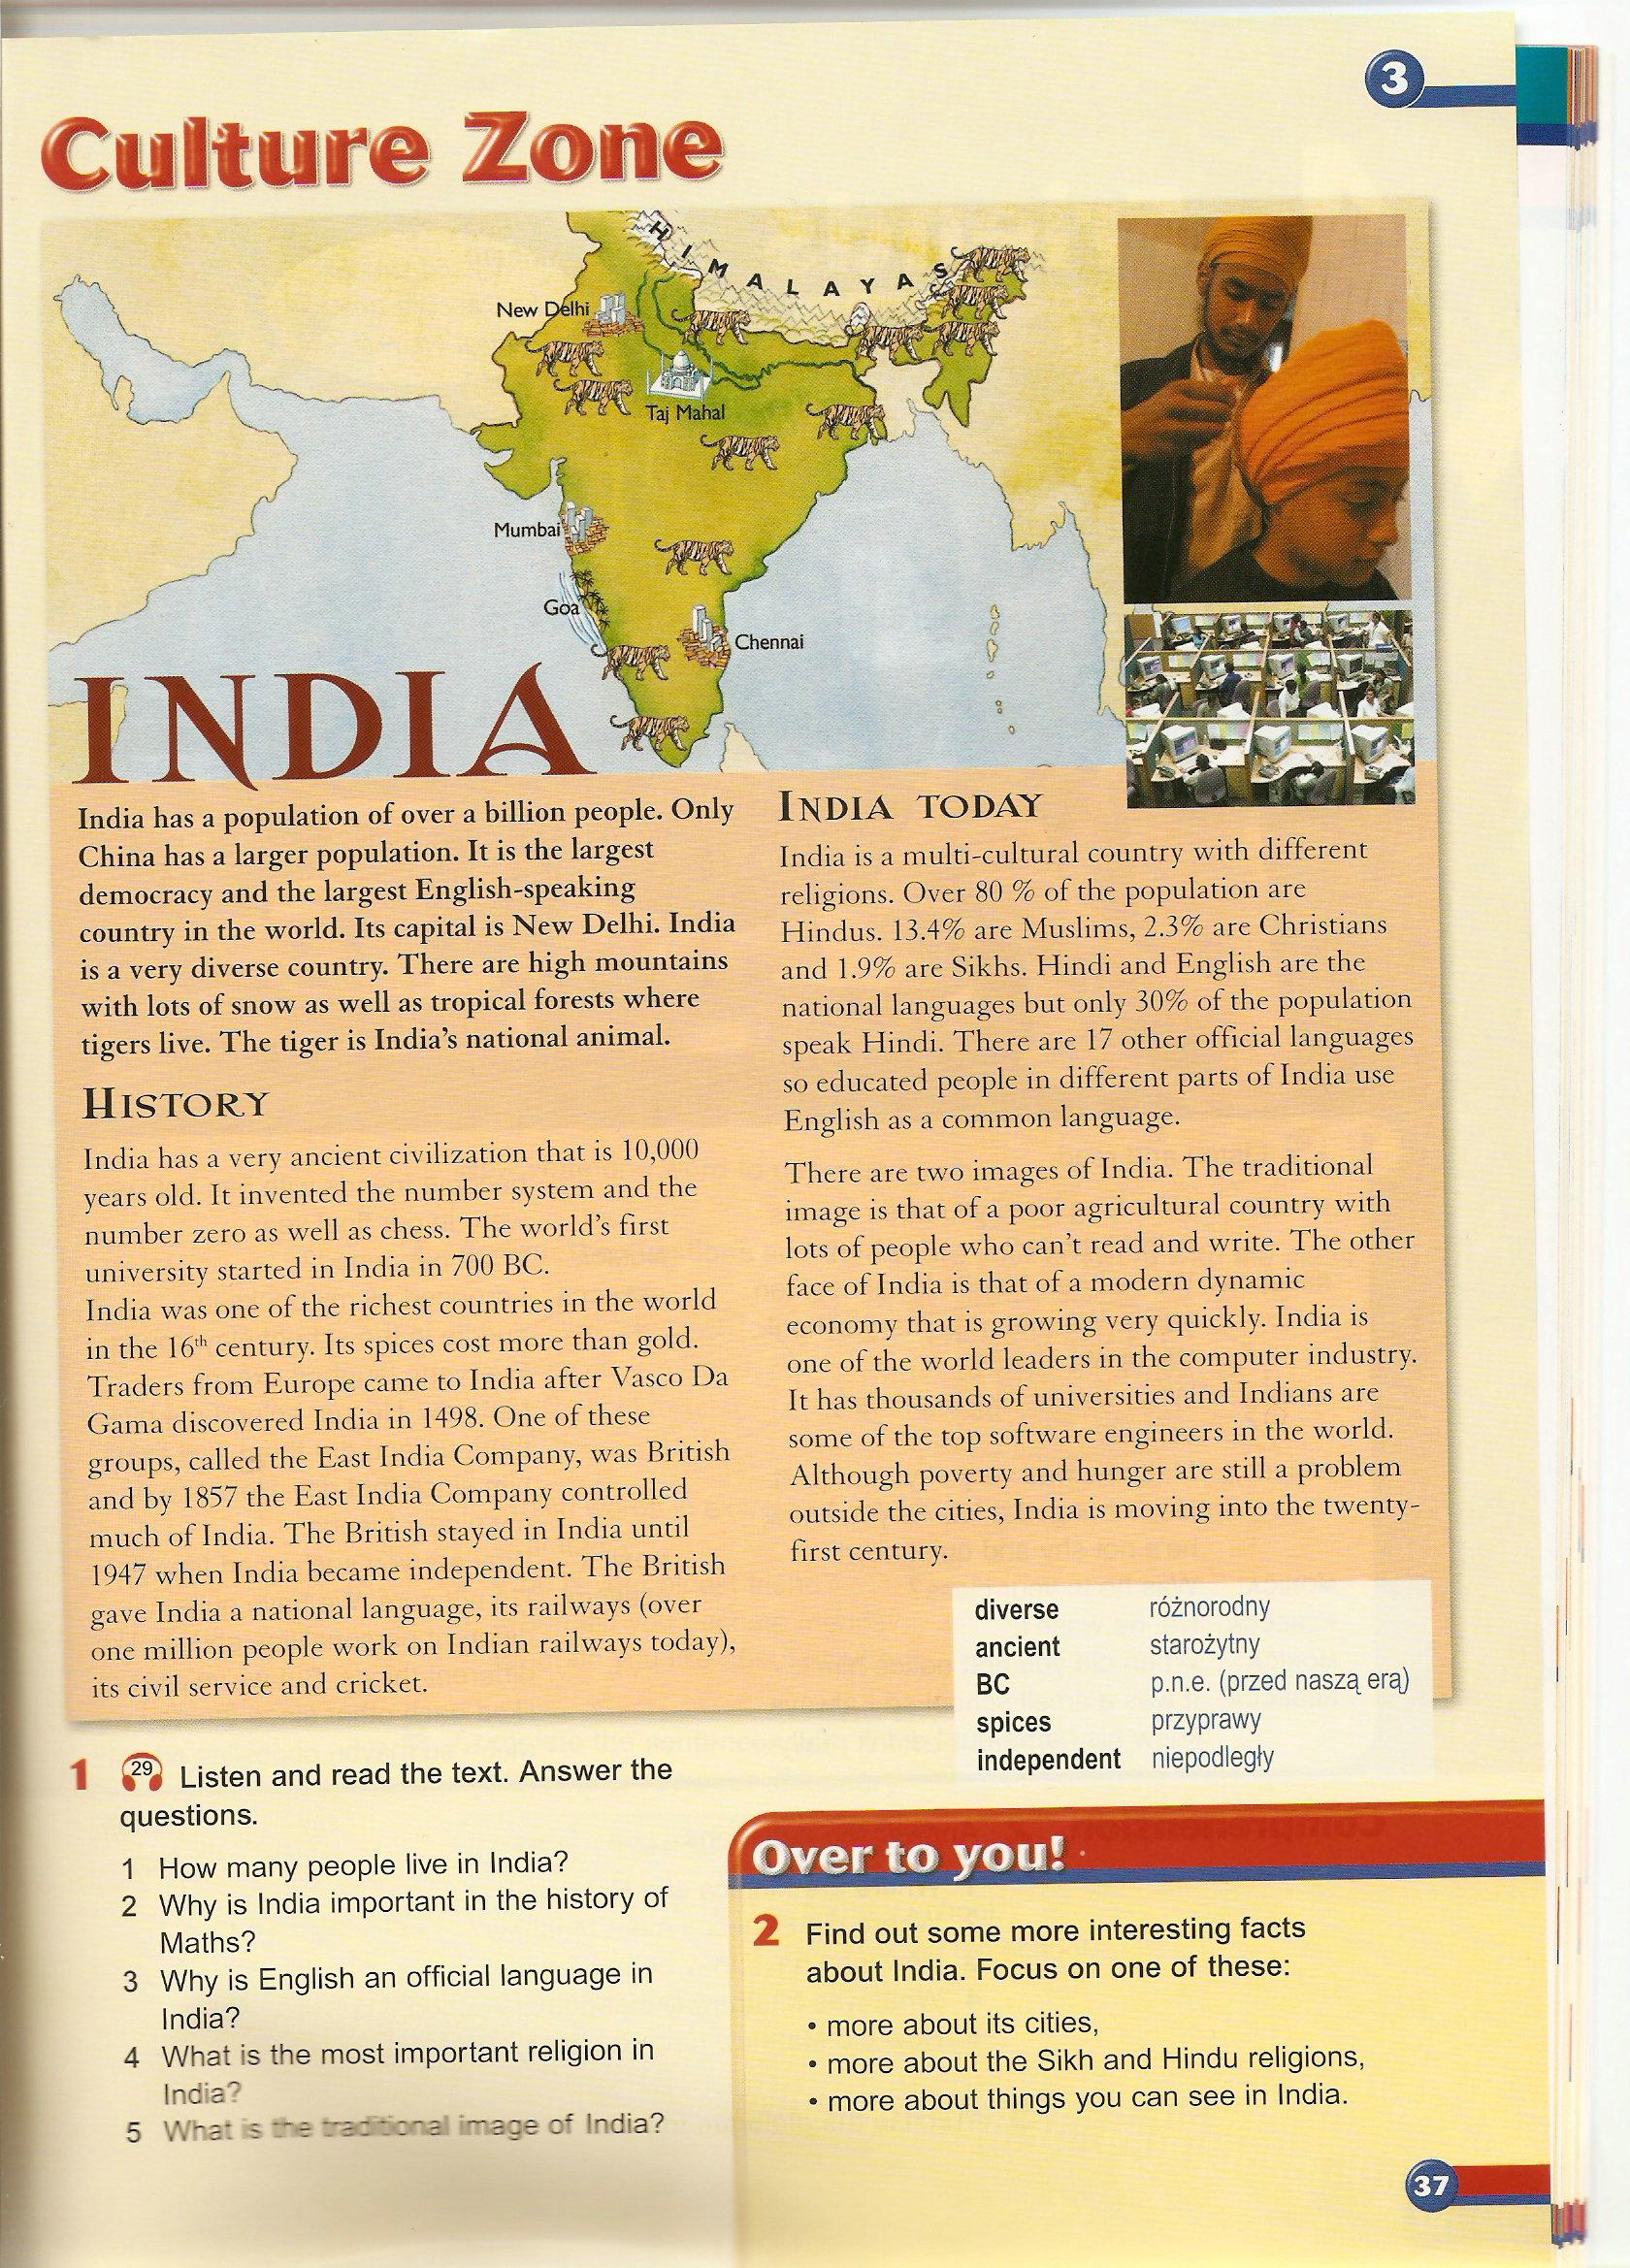 Rob Nolasco and David Newbold - Misinformation about India